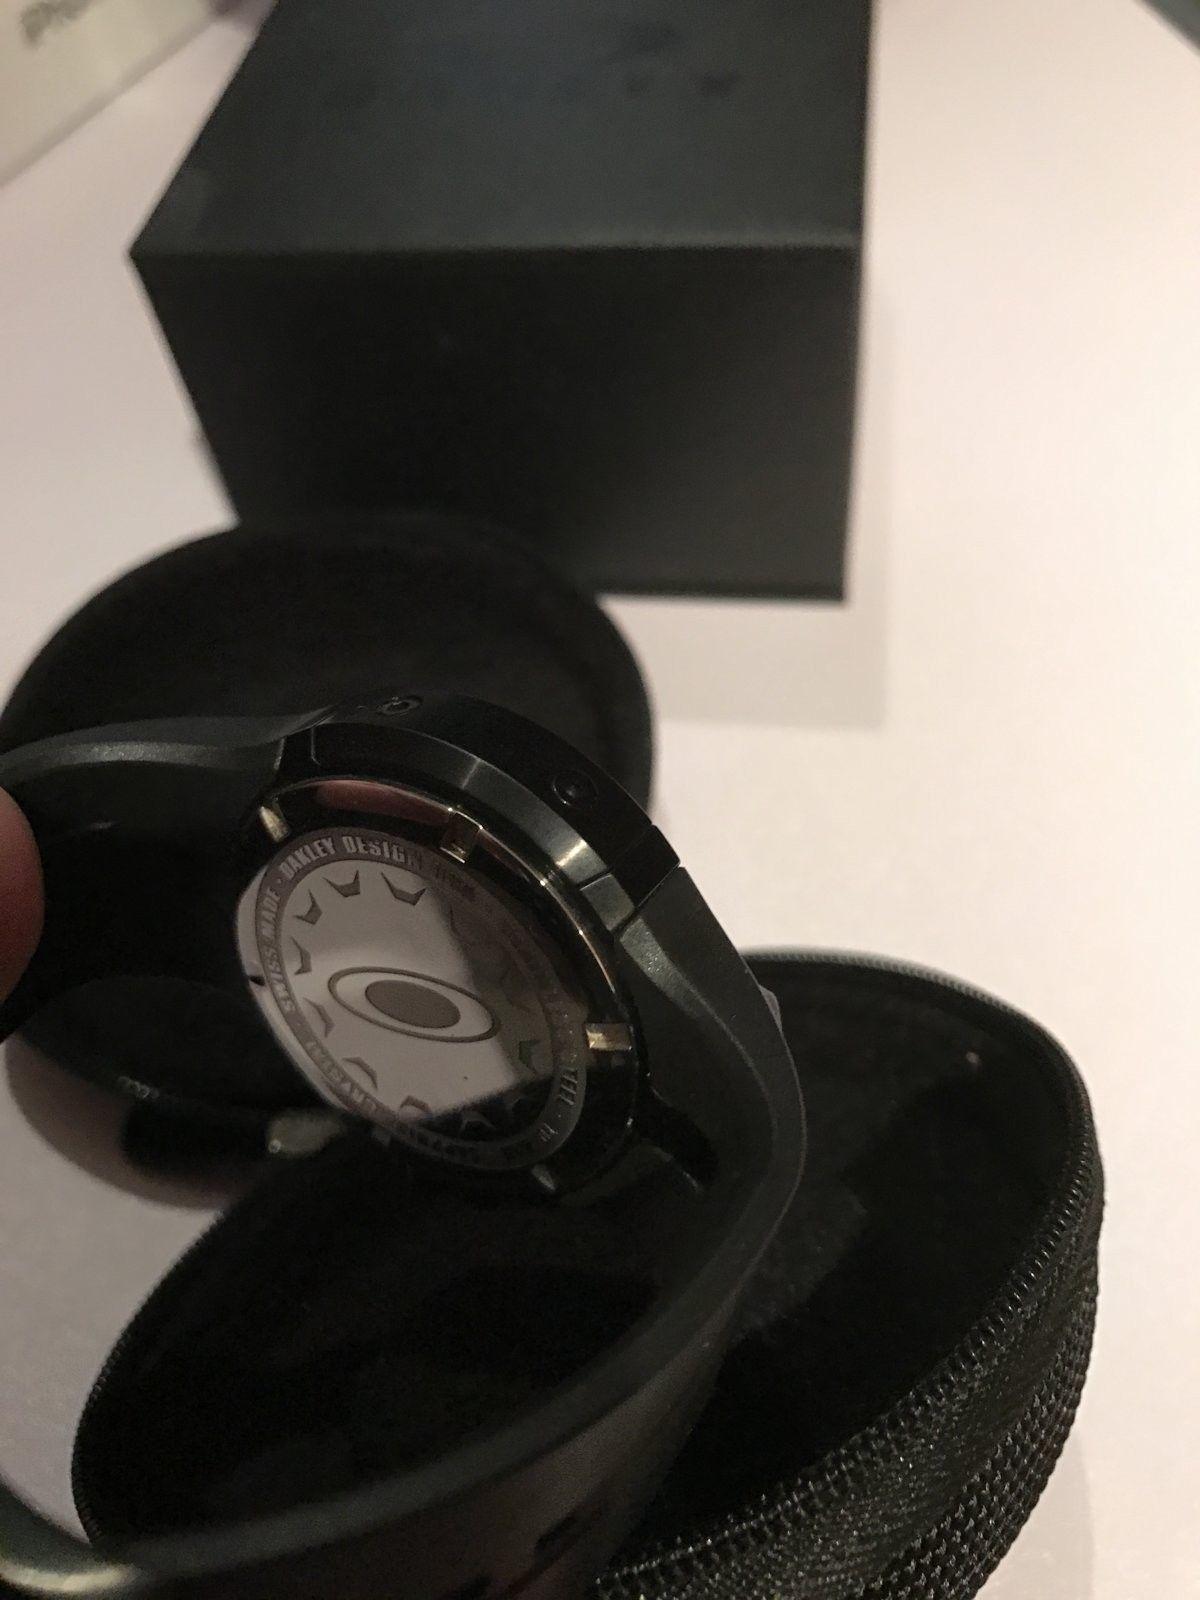 Bottle cap stealth black/black dial and numbers watch - IMG_4601.JPG